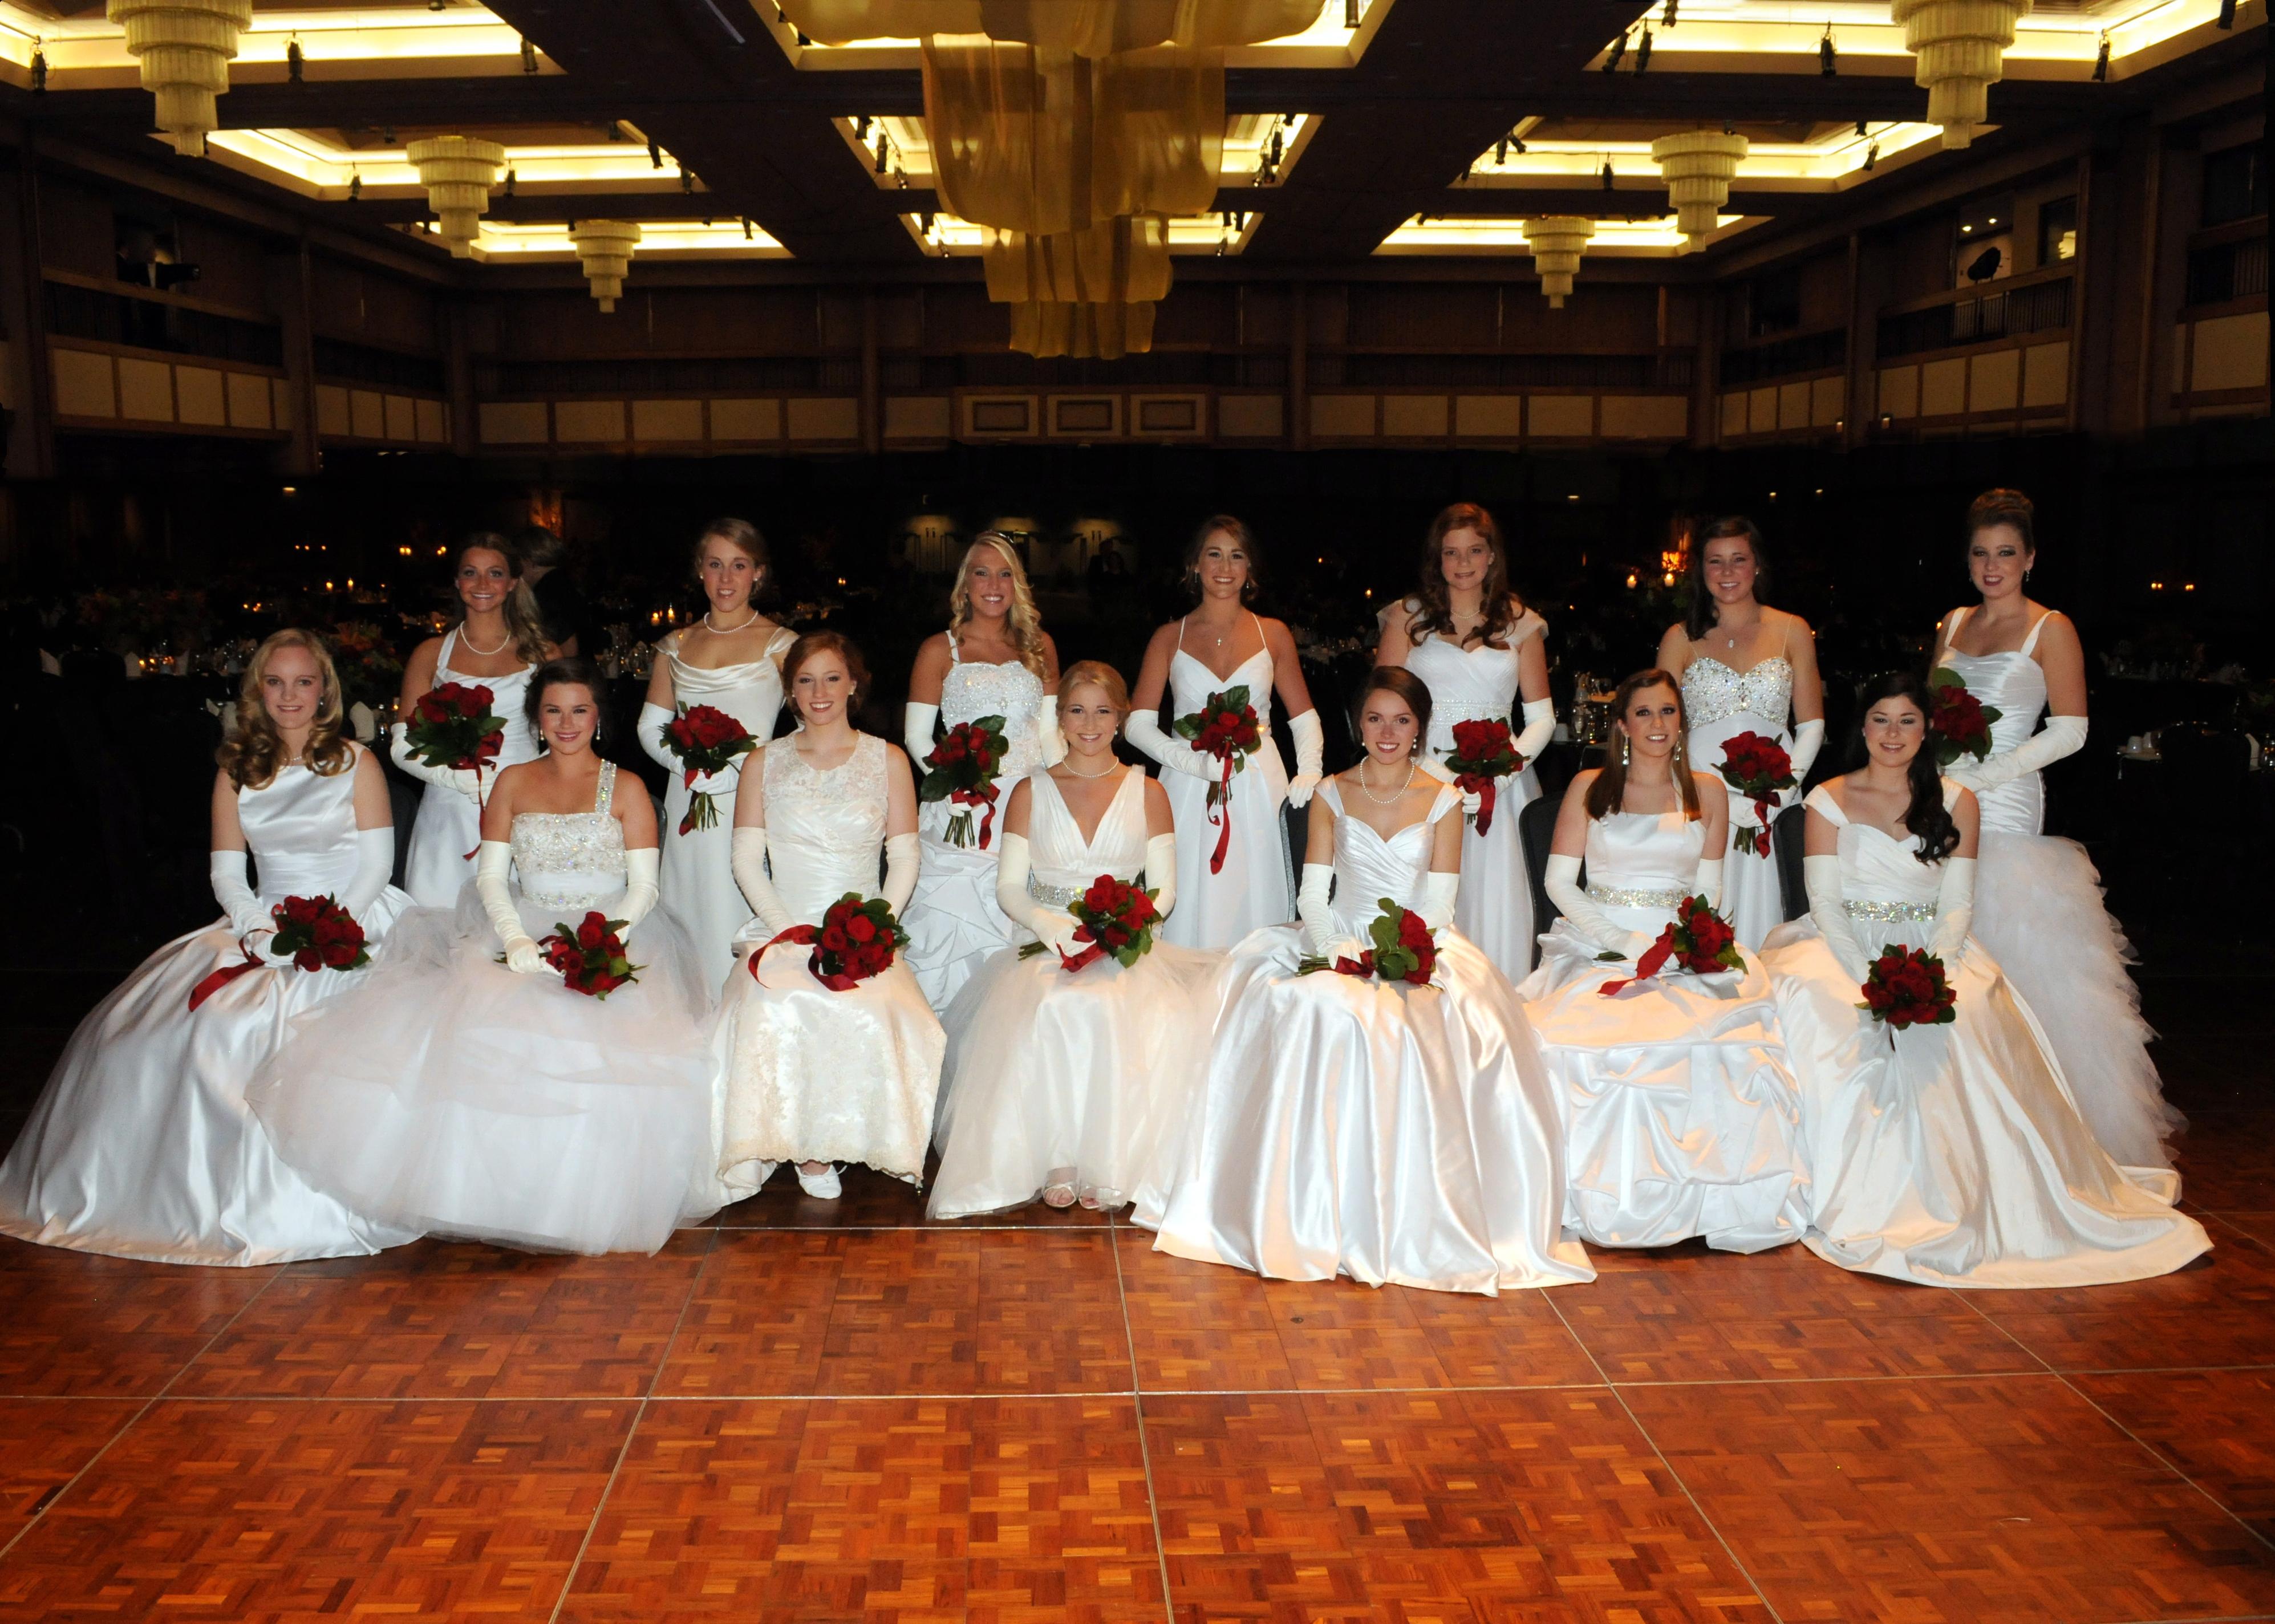 2013 Huntsville Symphony Orchestra Debutantes Group 3